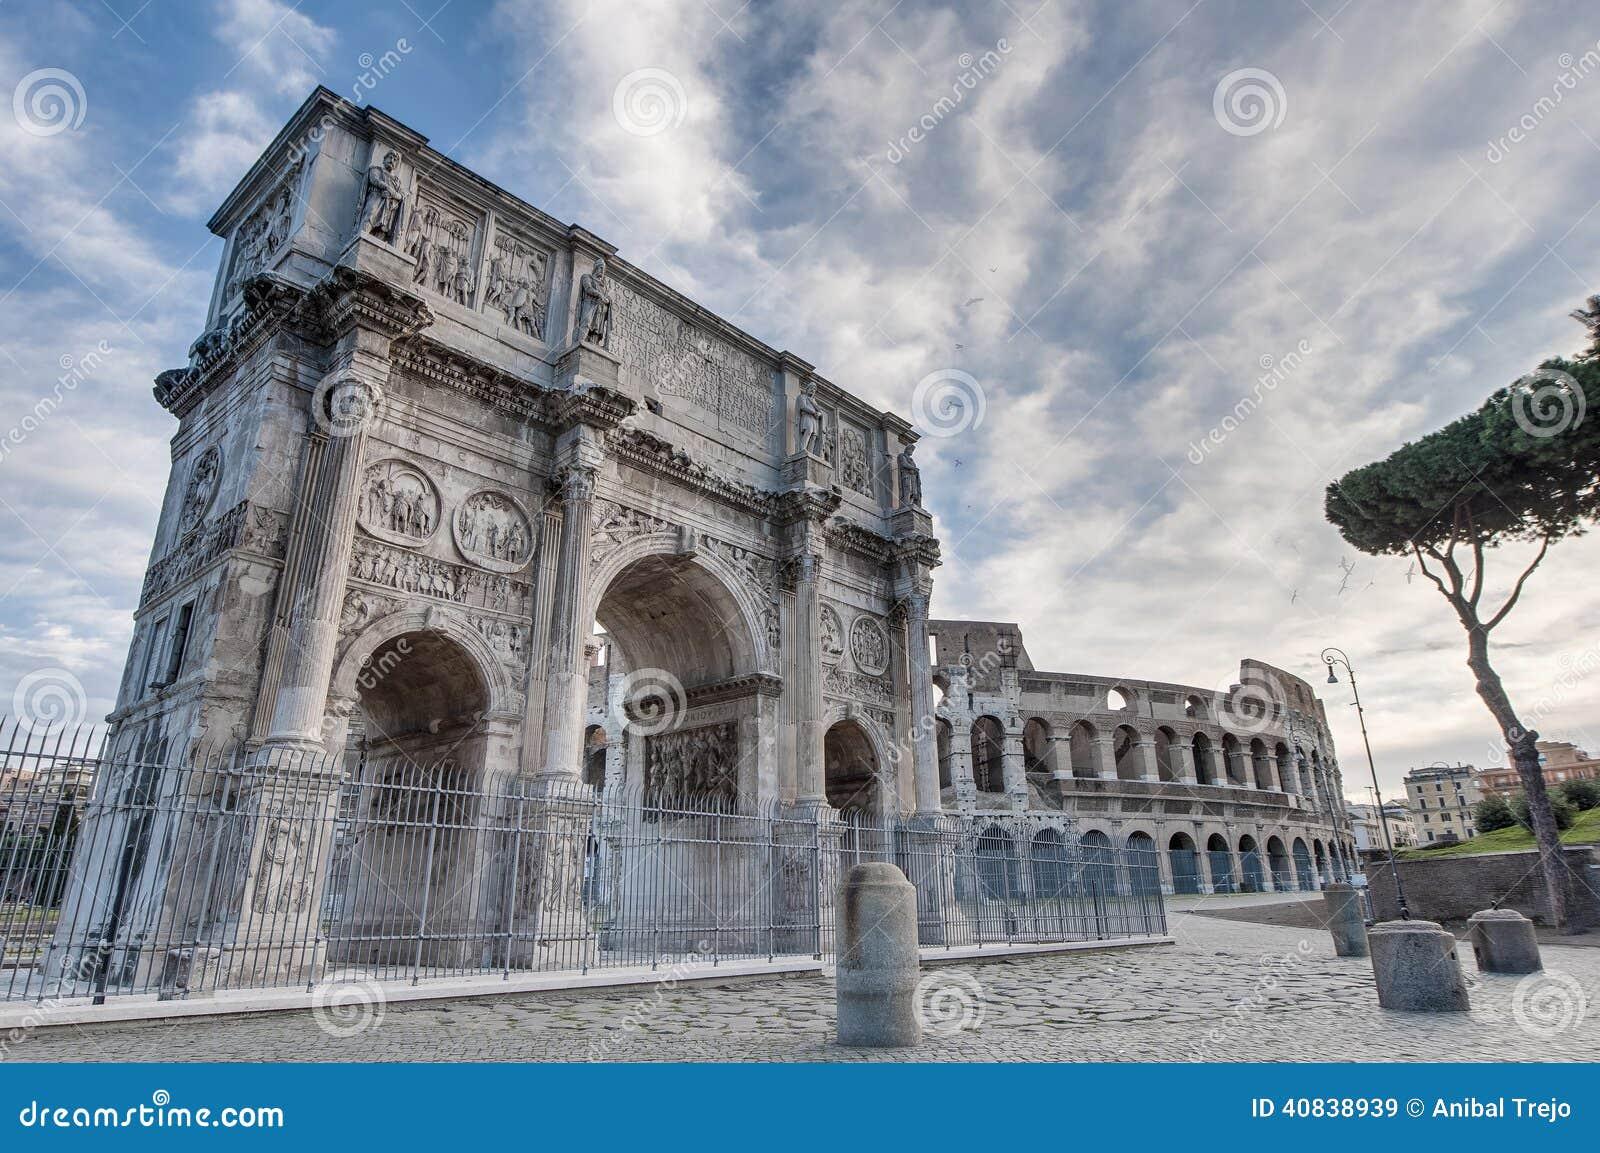 Arco de Constantim em Roma, Italia